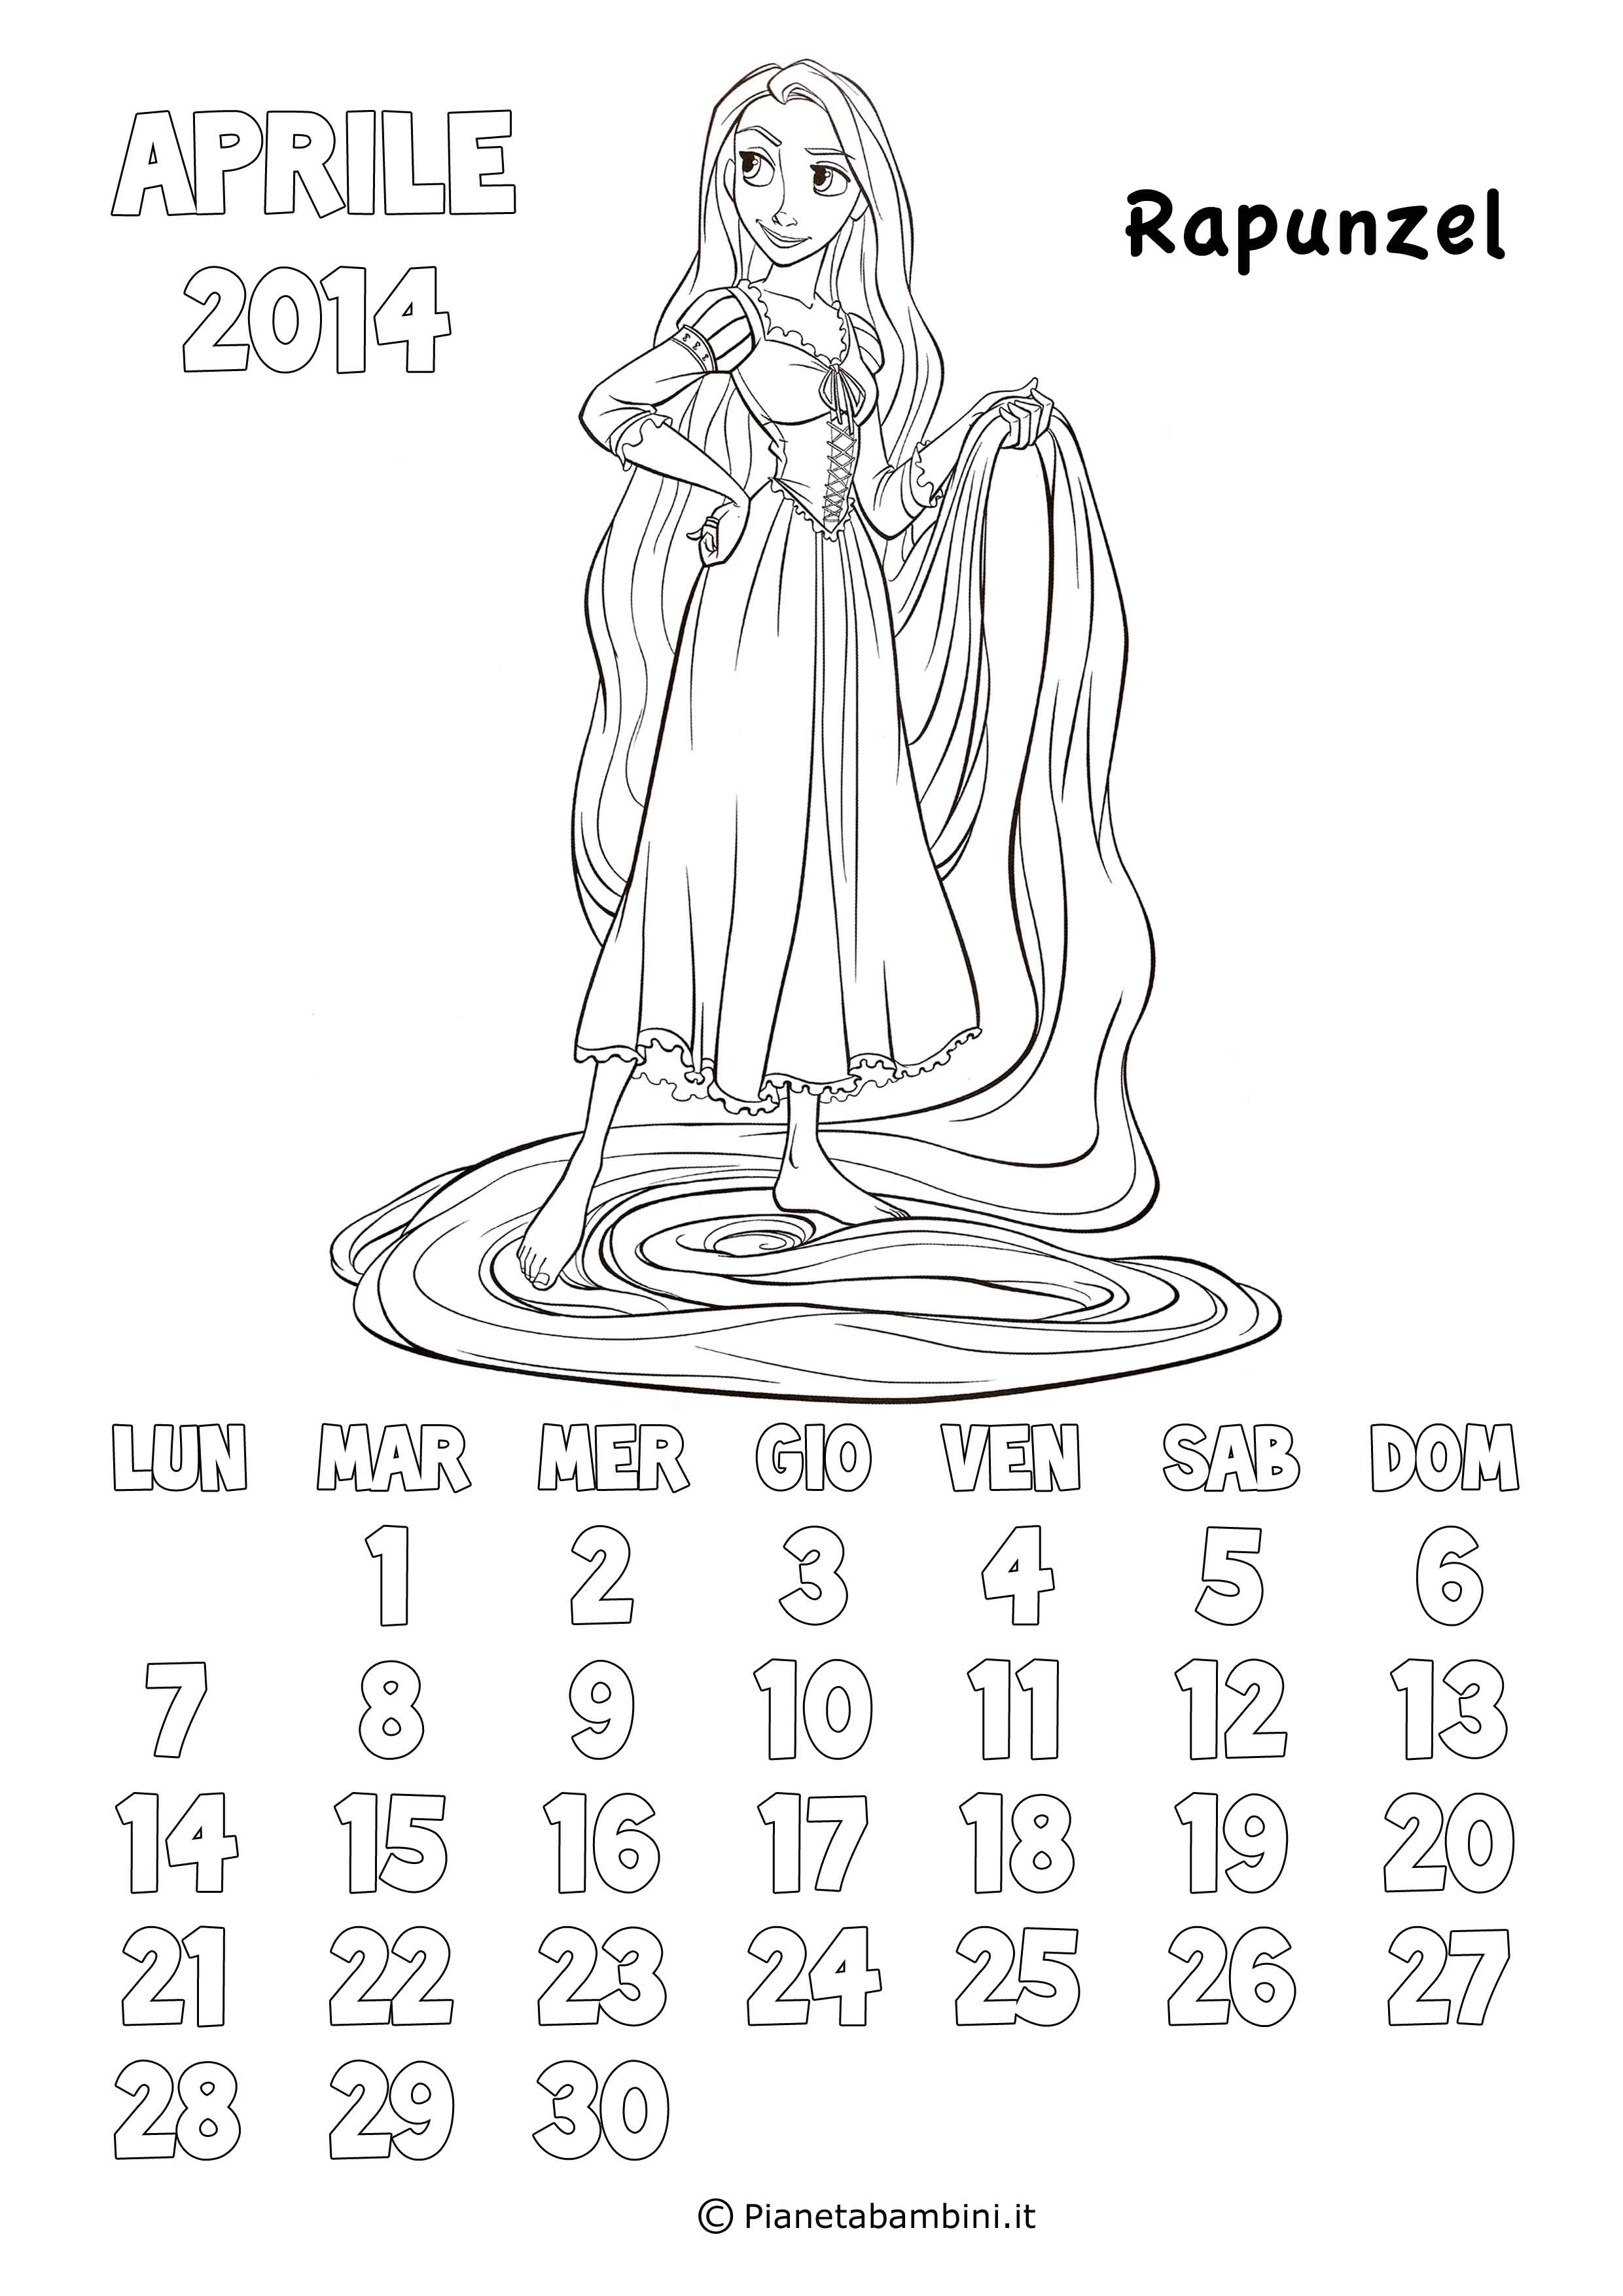 Aprile-2014-Rapunzel